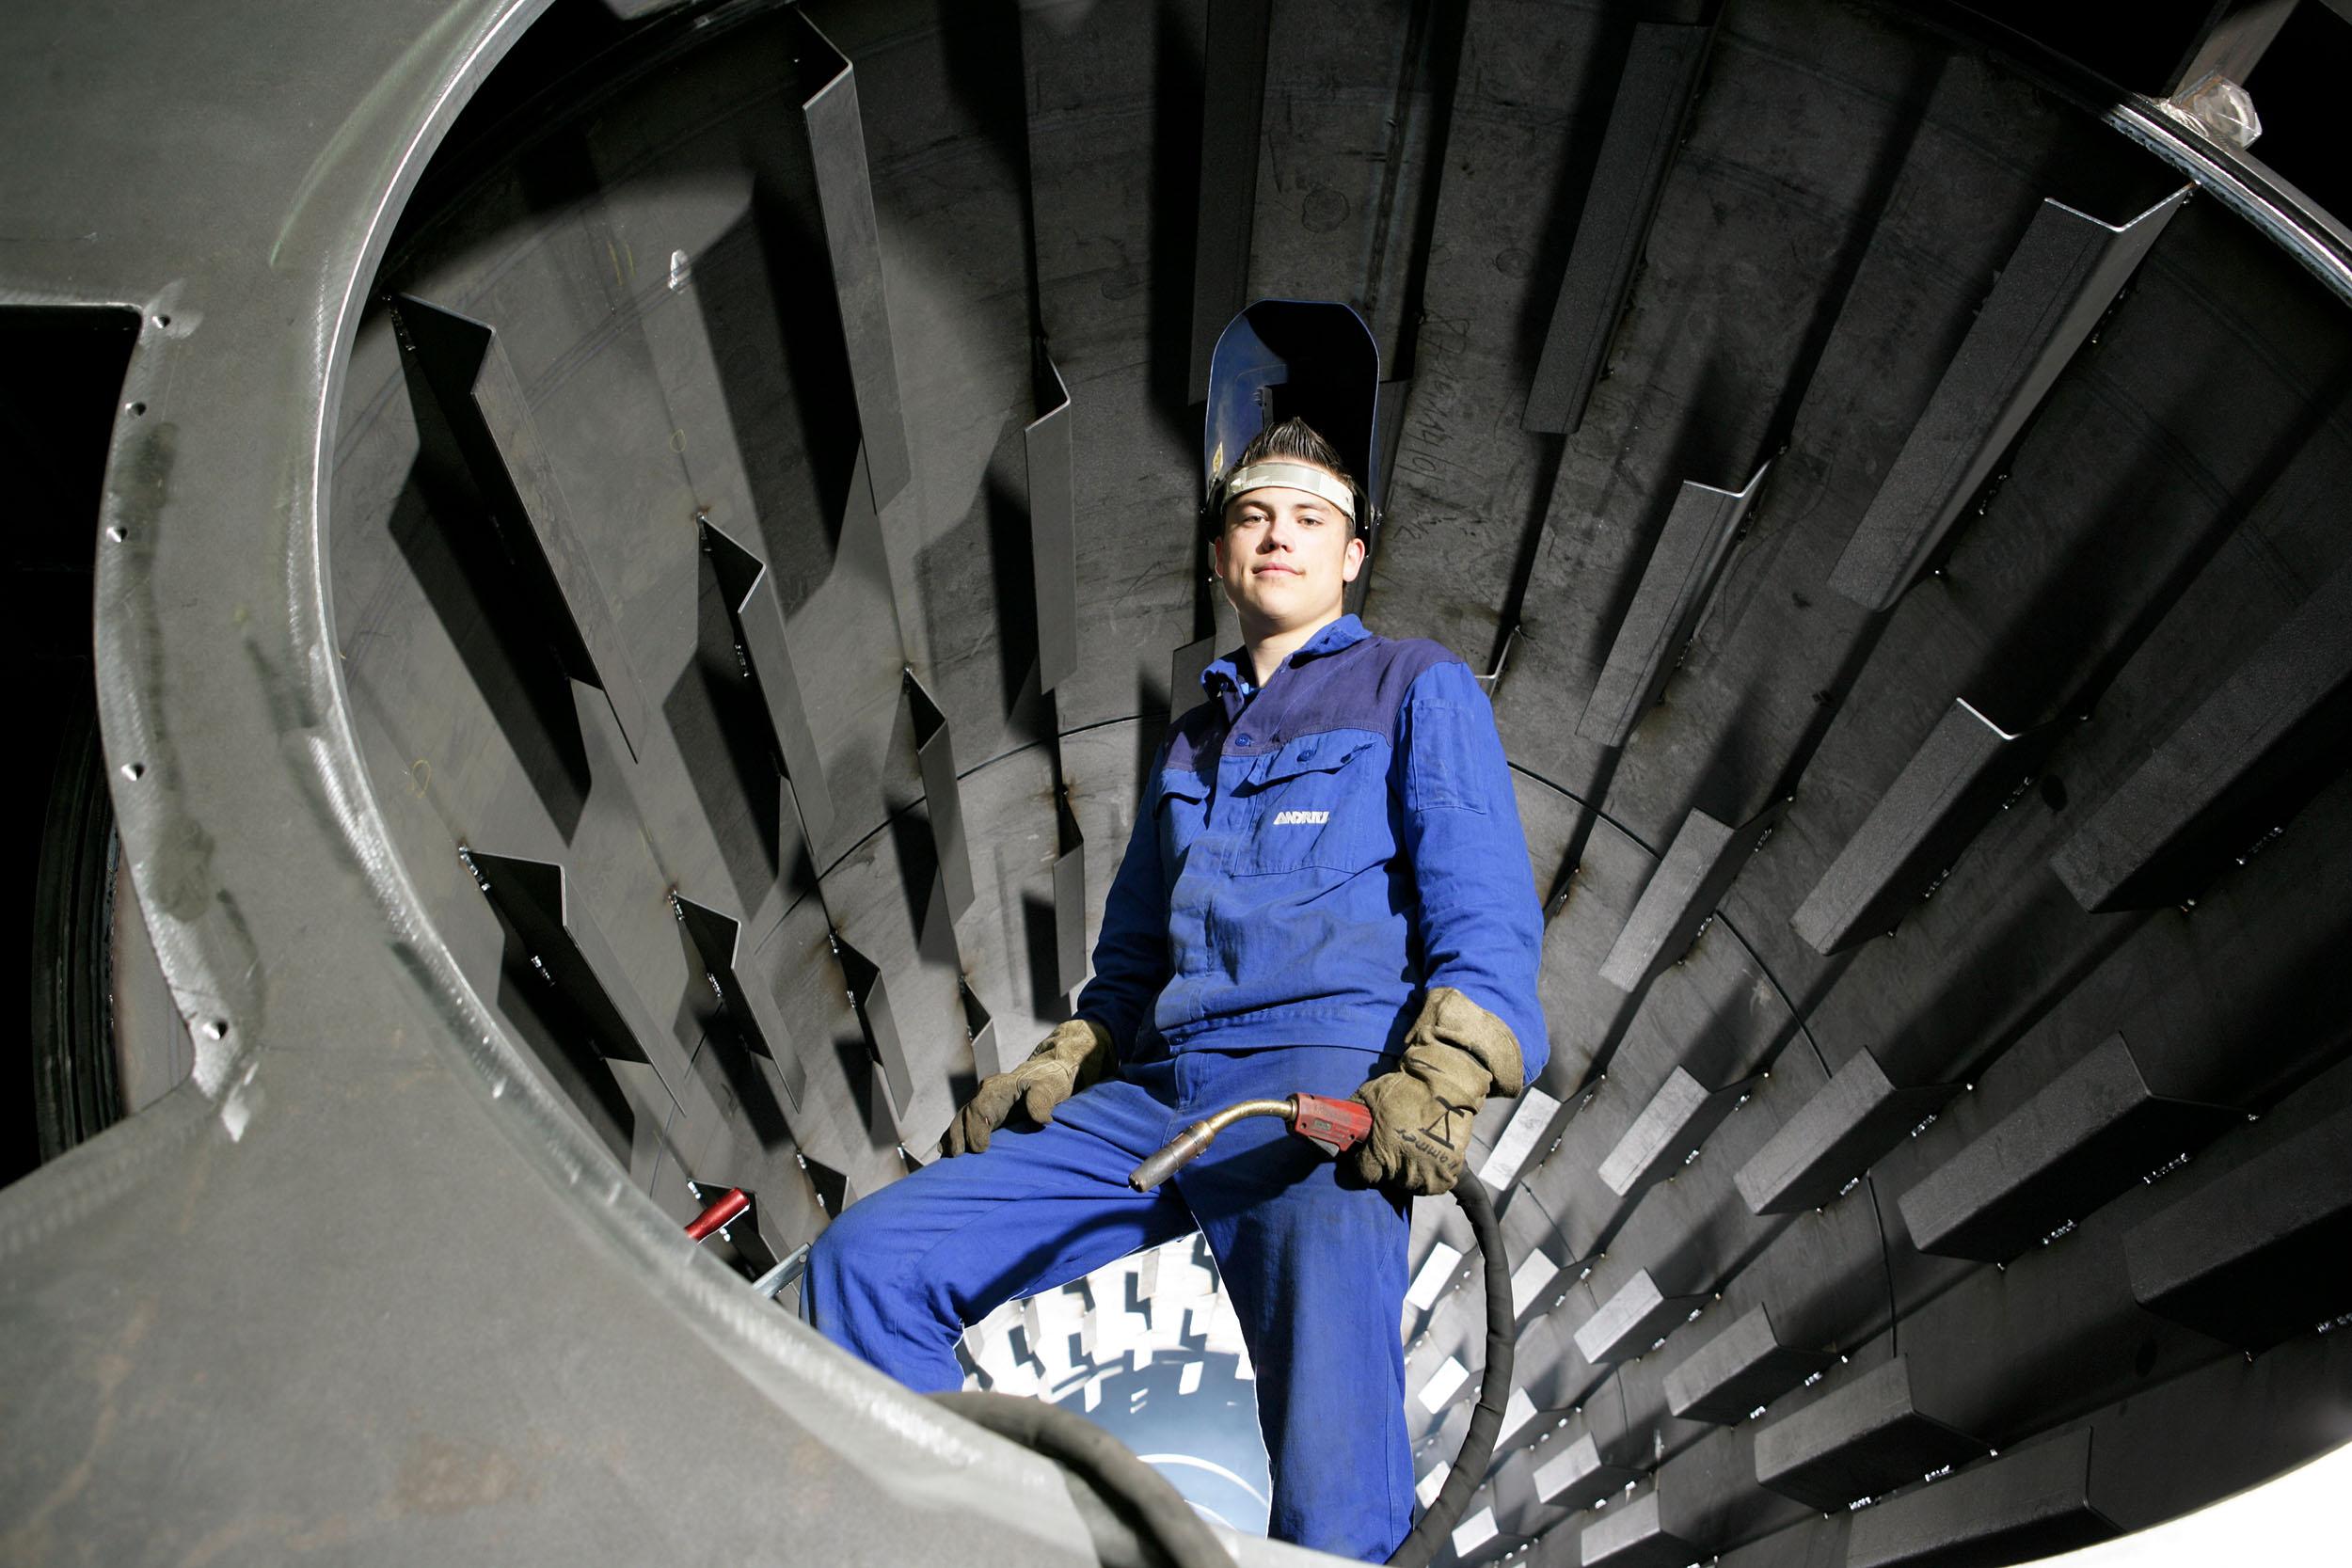 Apprenticeship Training In Weiz Andritz Hydro Gmbh